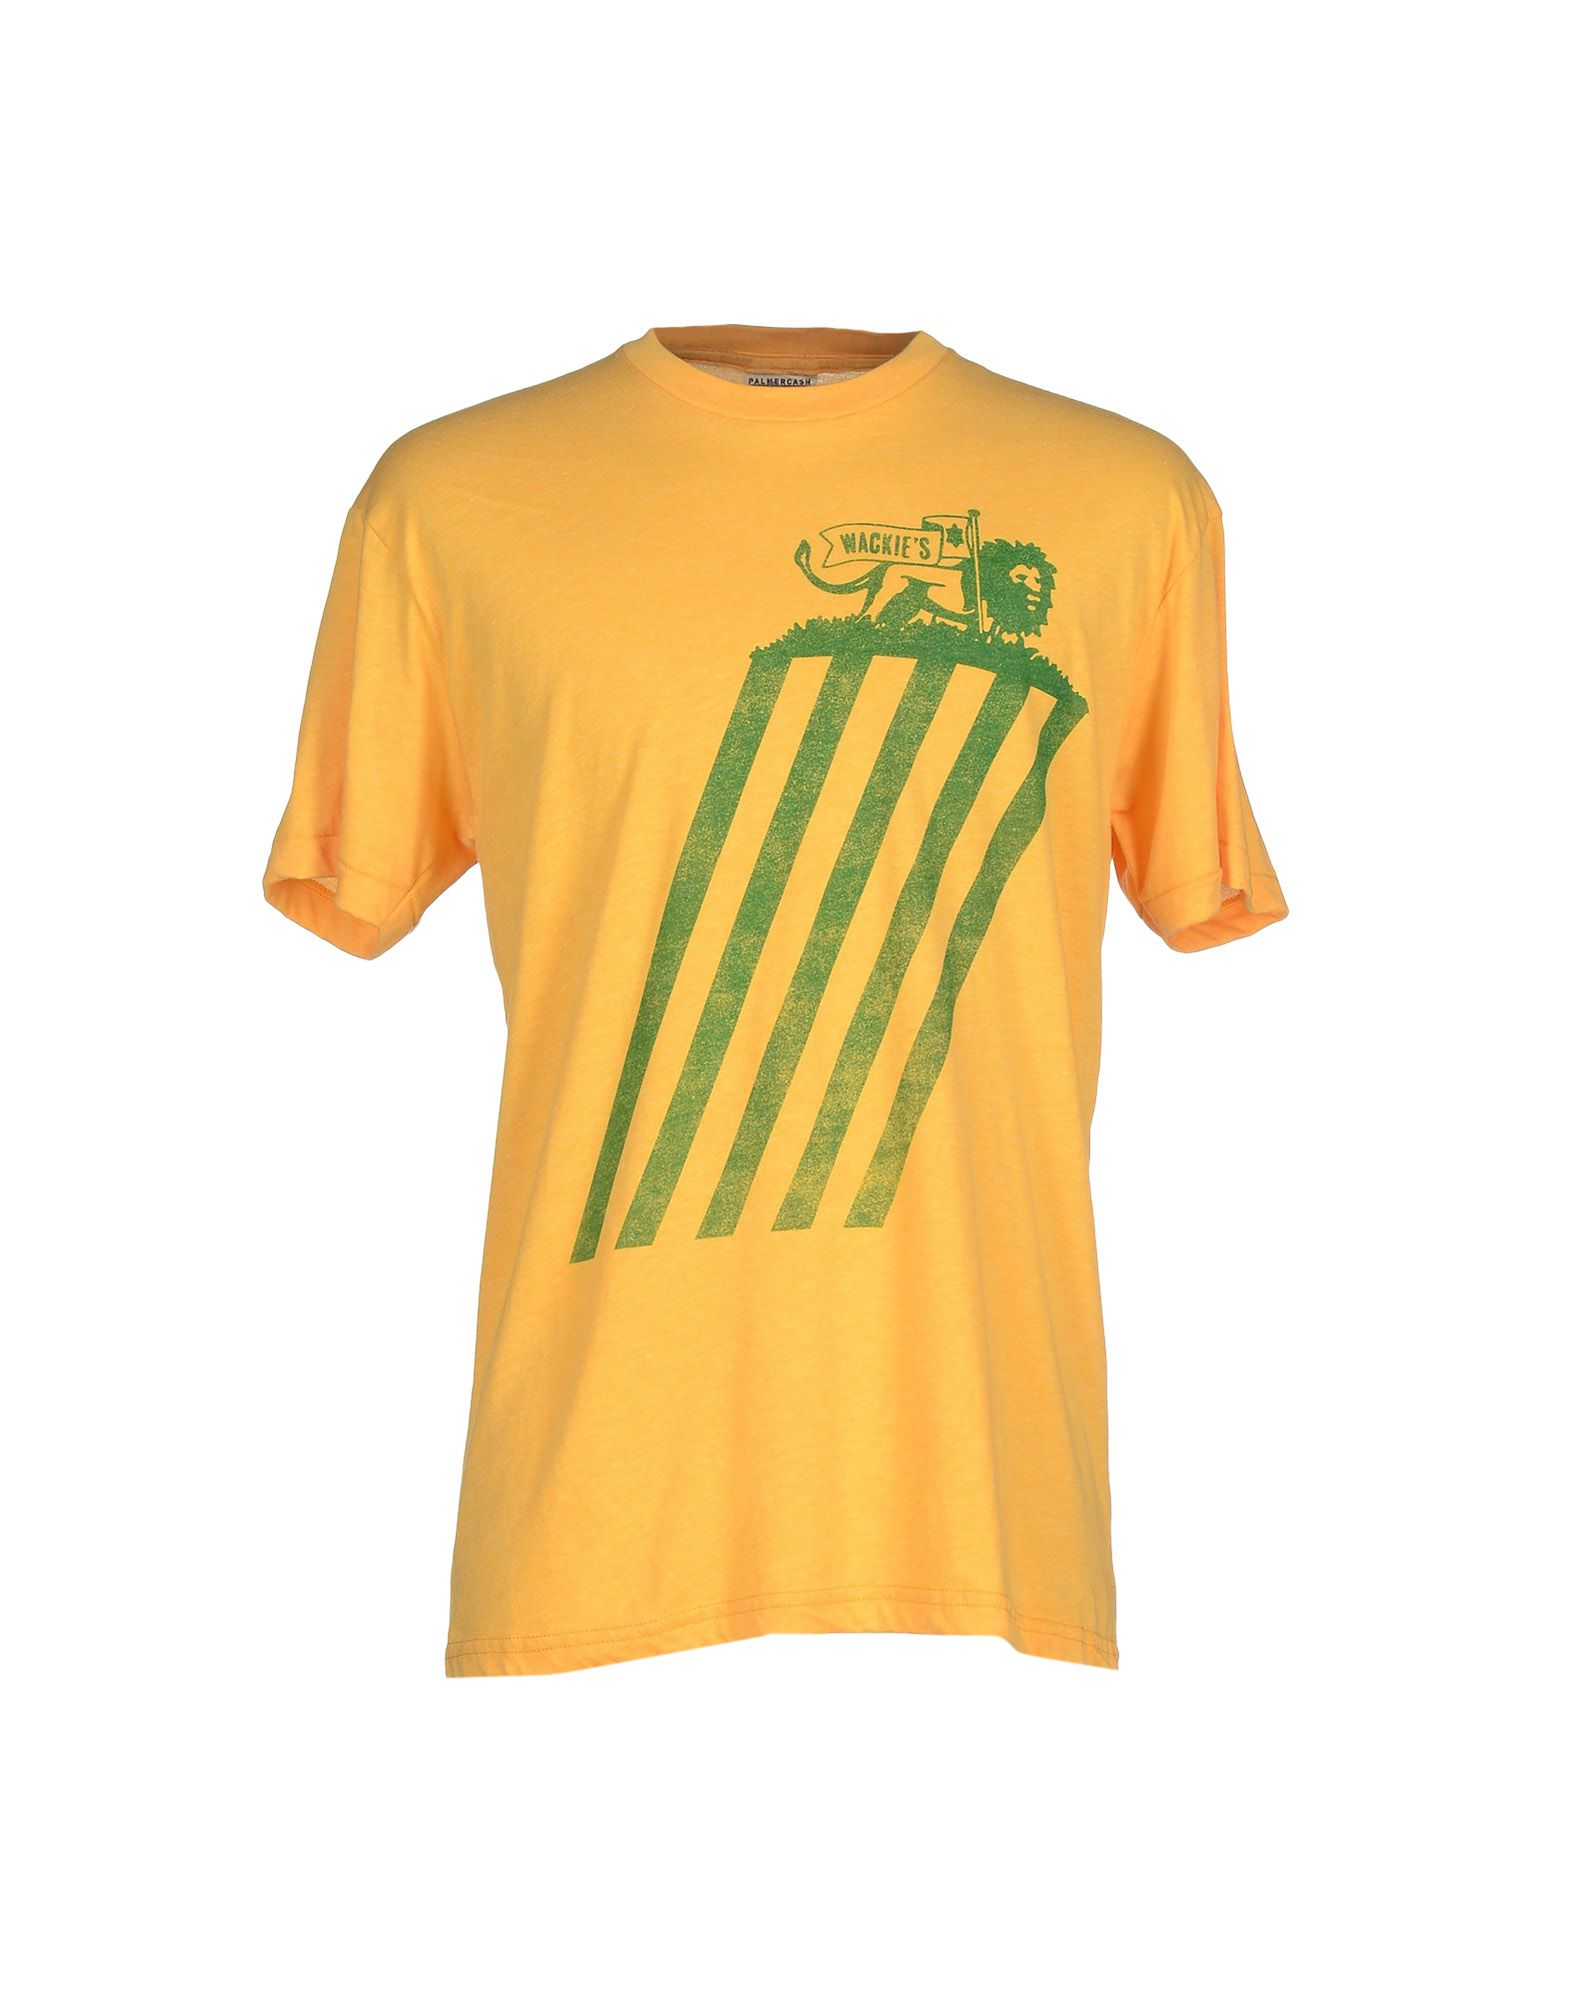 PALMER CASH T-shirts